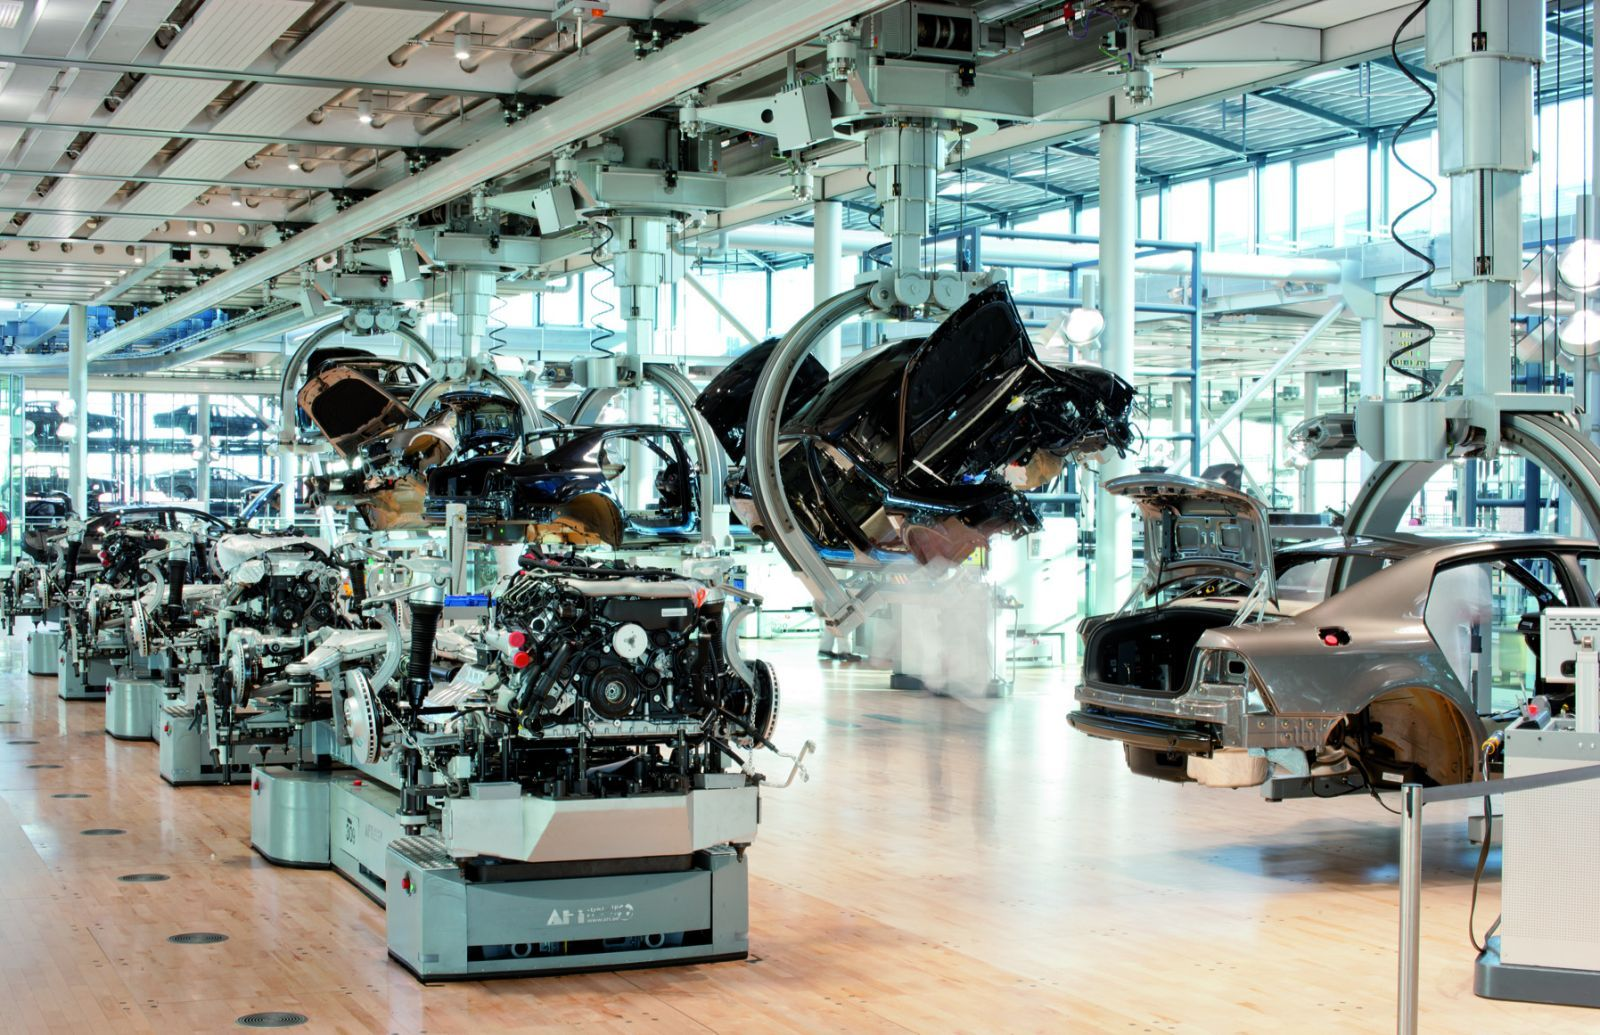 Audi assembly line - Audi4Ever - a4e Blog - Detail - Presse - Gläserne Manufaktur feiert zehnten Geburtstag